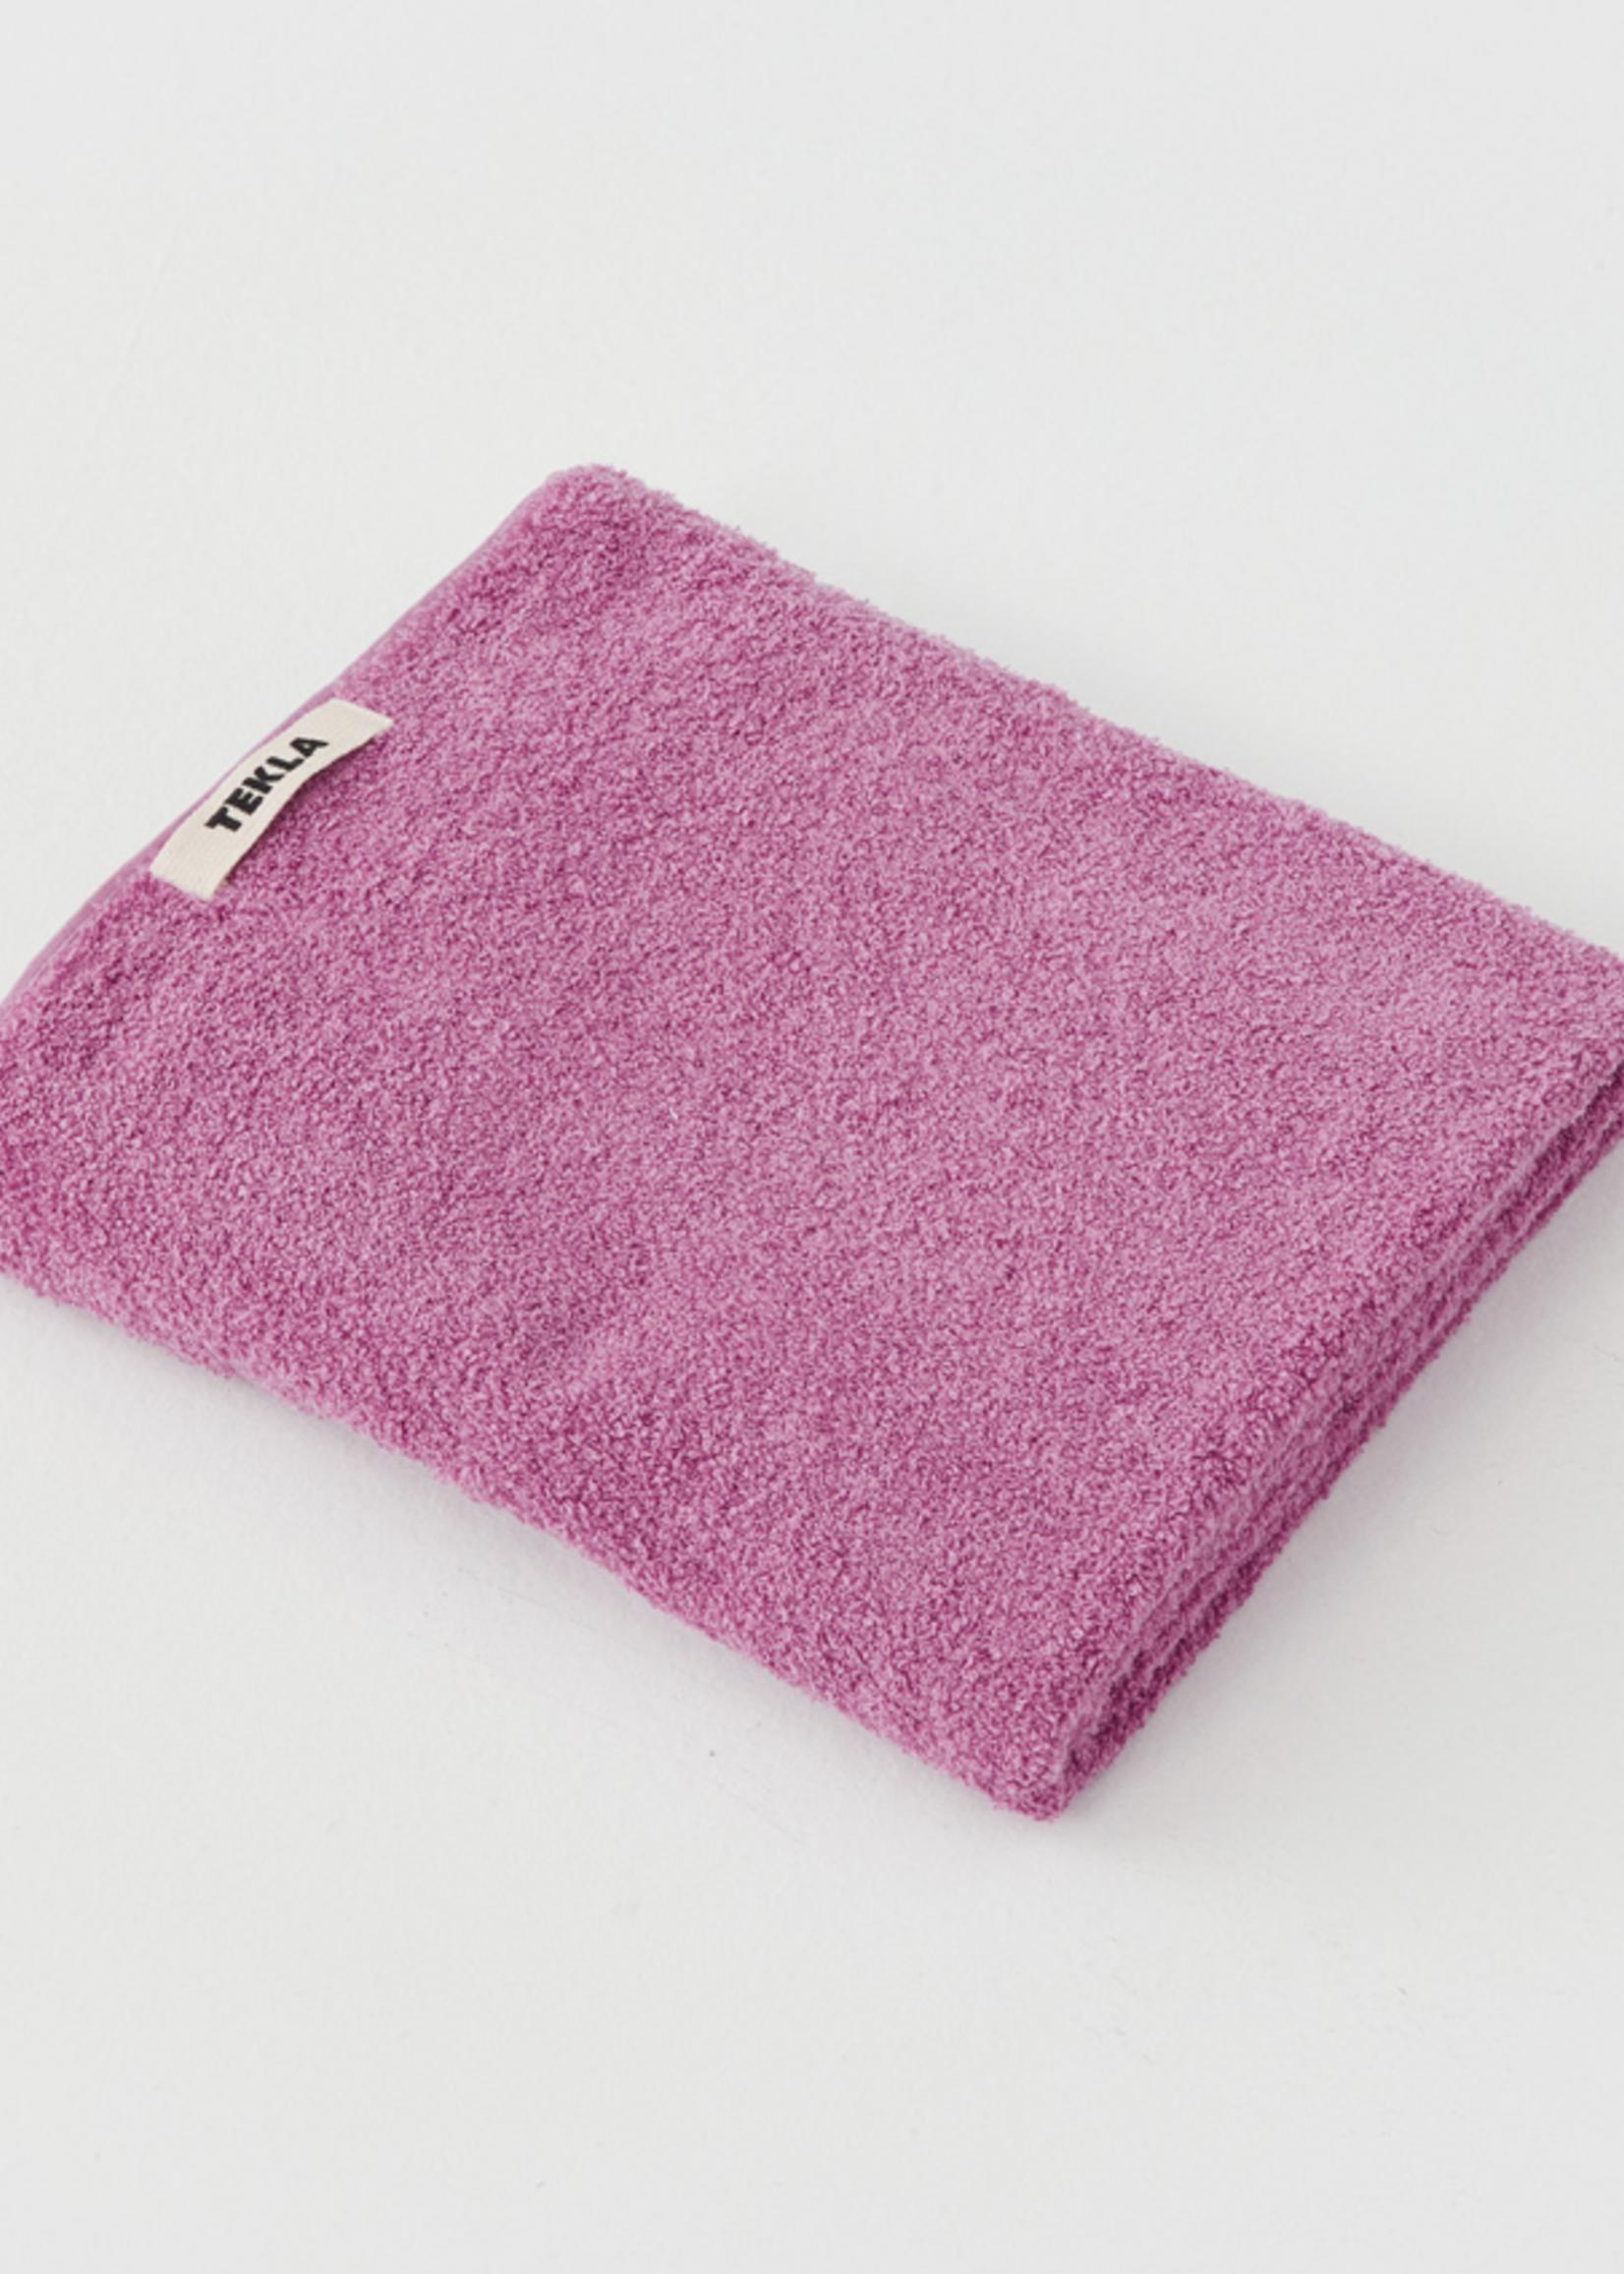 TEKLA Organic Bath Towel in Magenta